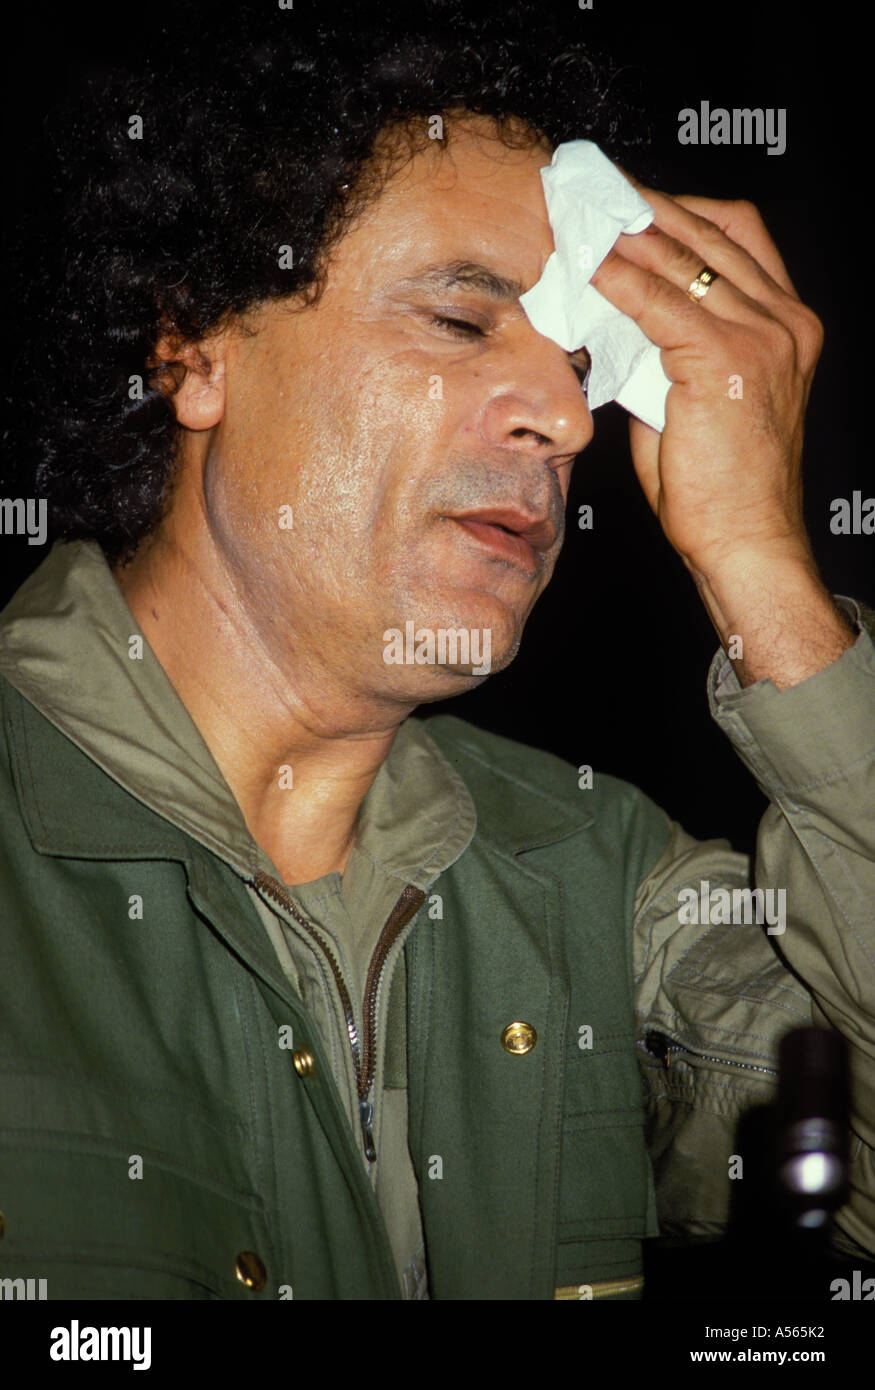 Stressed Colonel Muammar al Gaddafi Libya - Stock Image